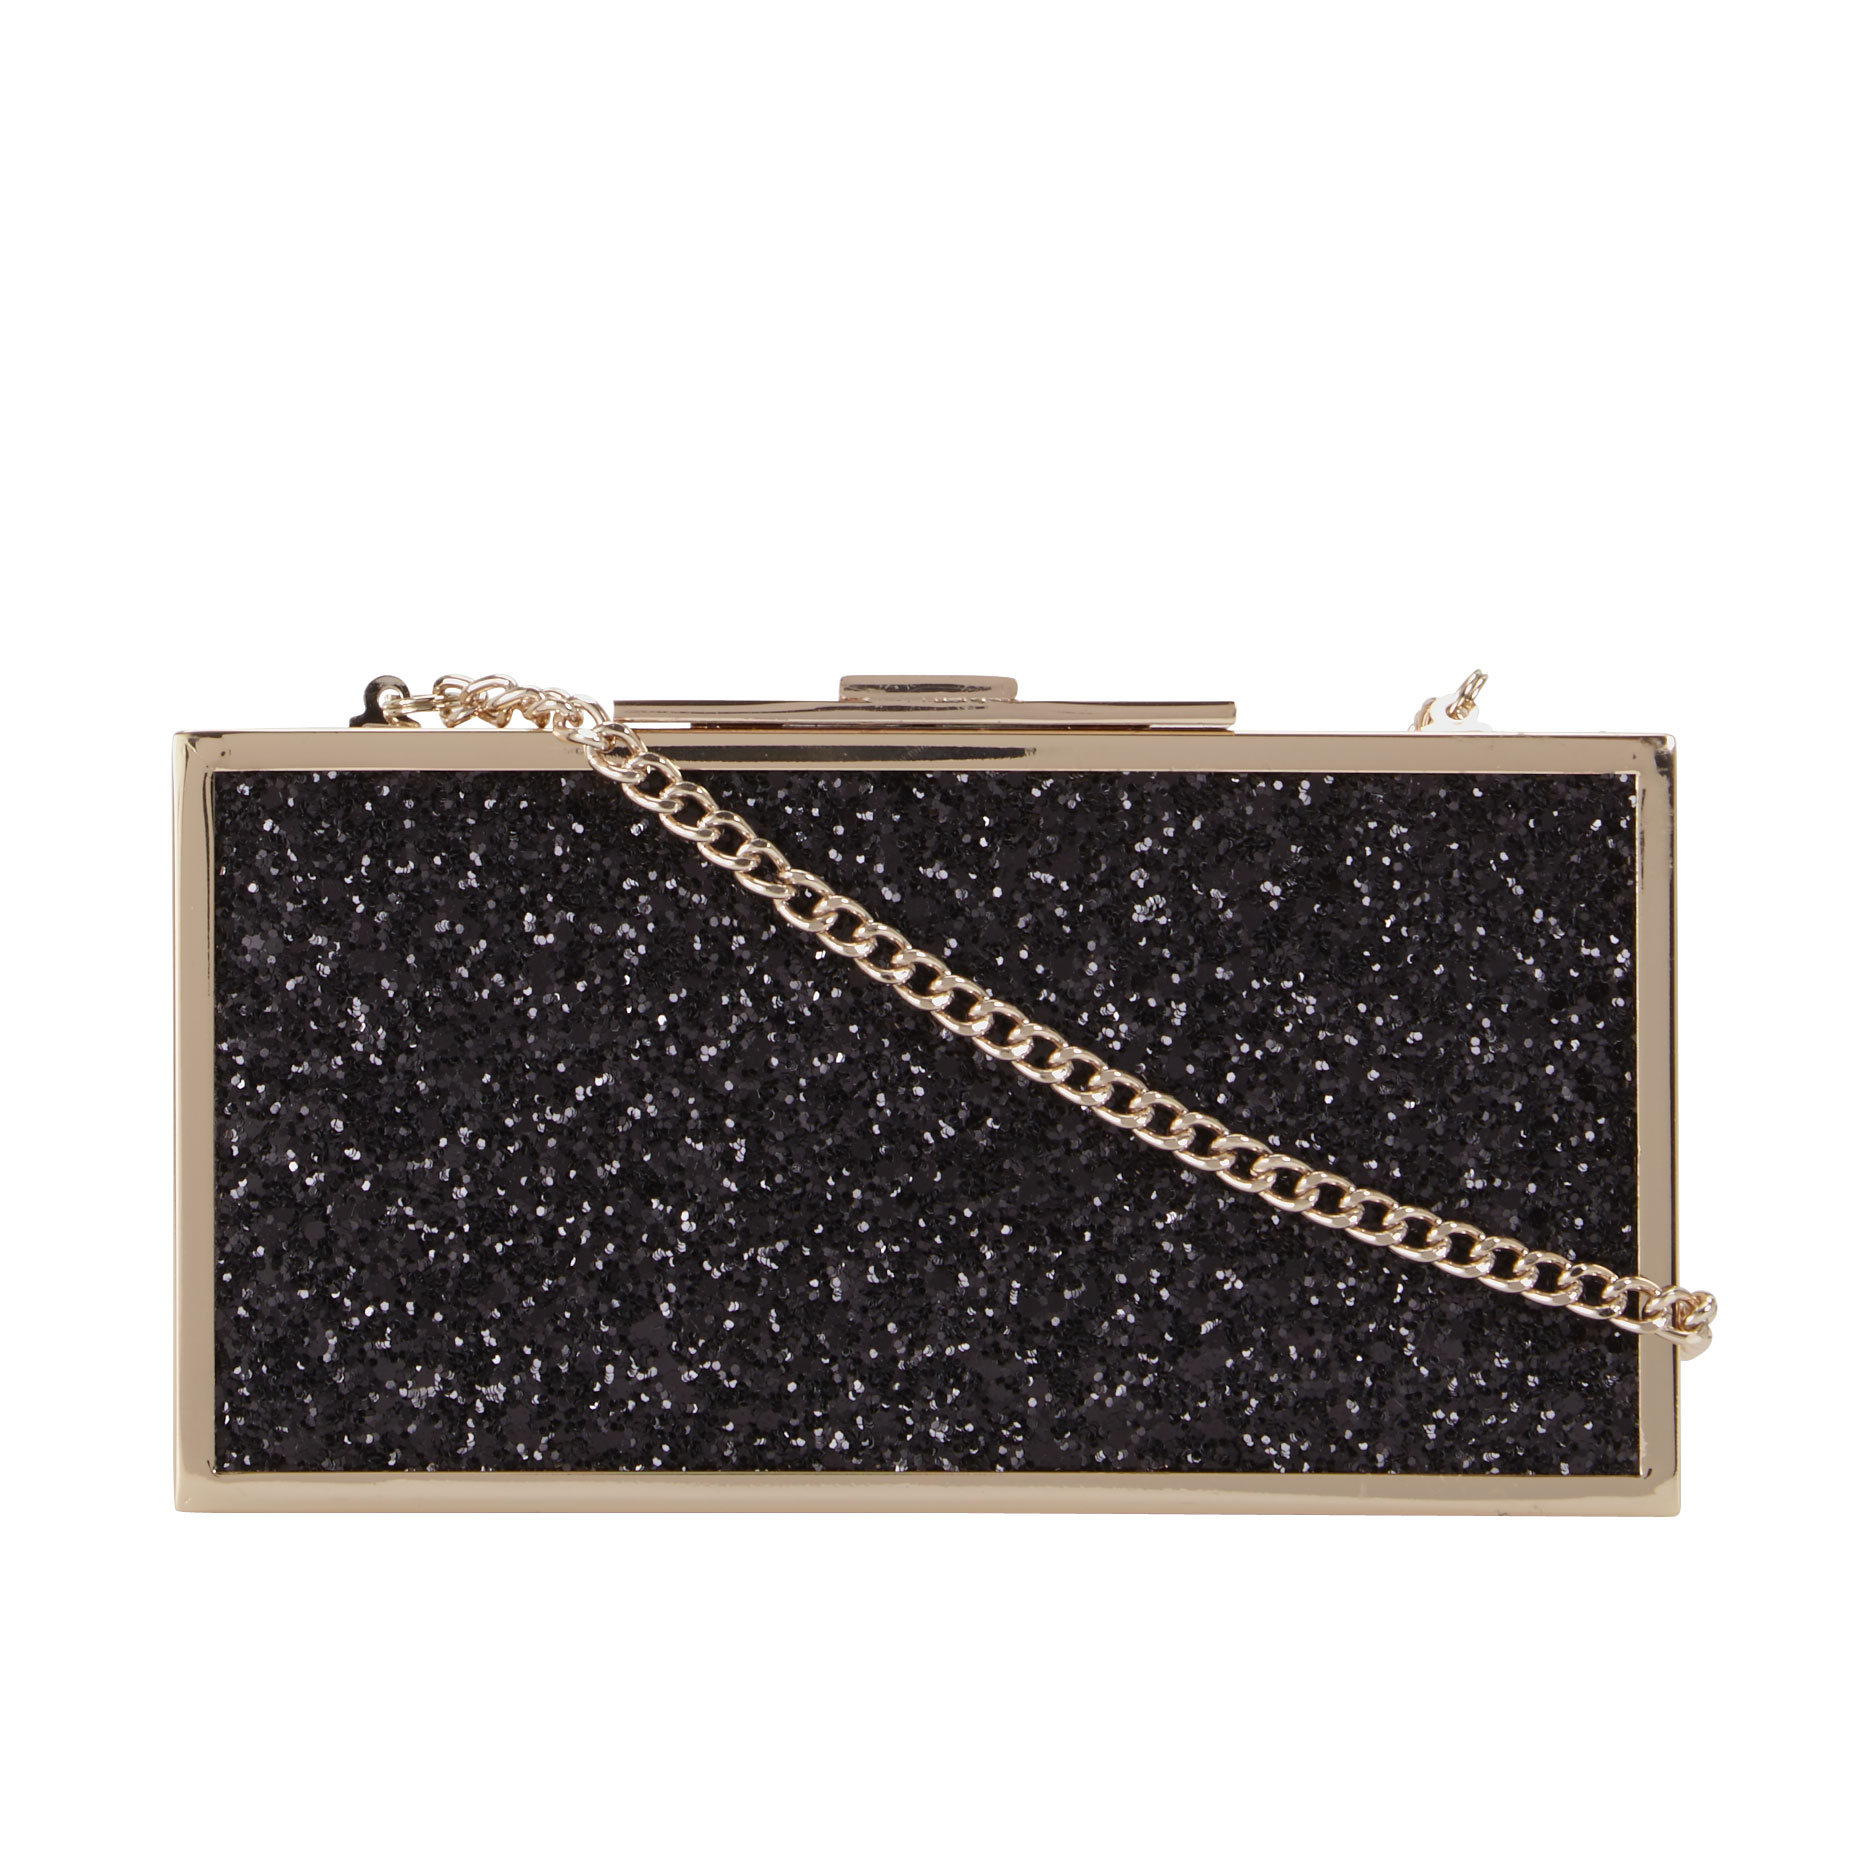 Dune Exquisite Glitter Clutch Bag